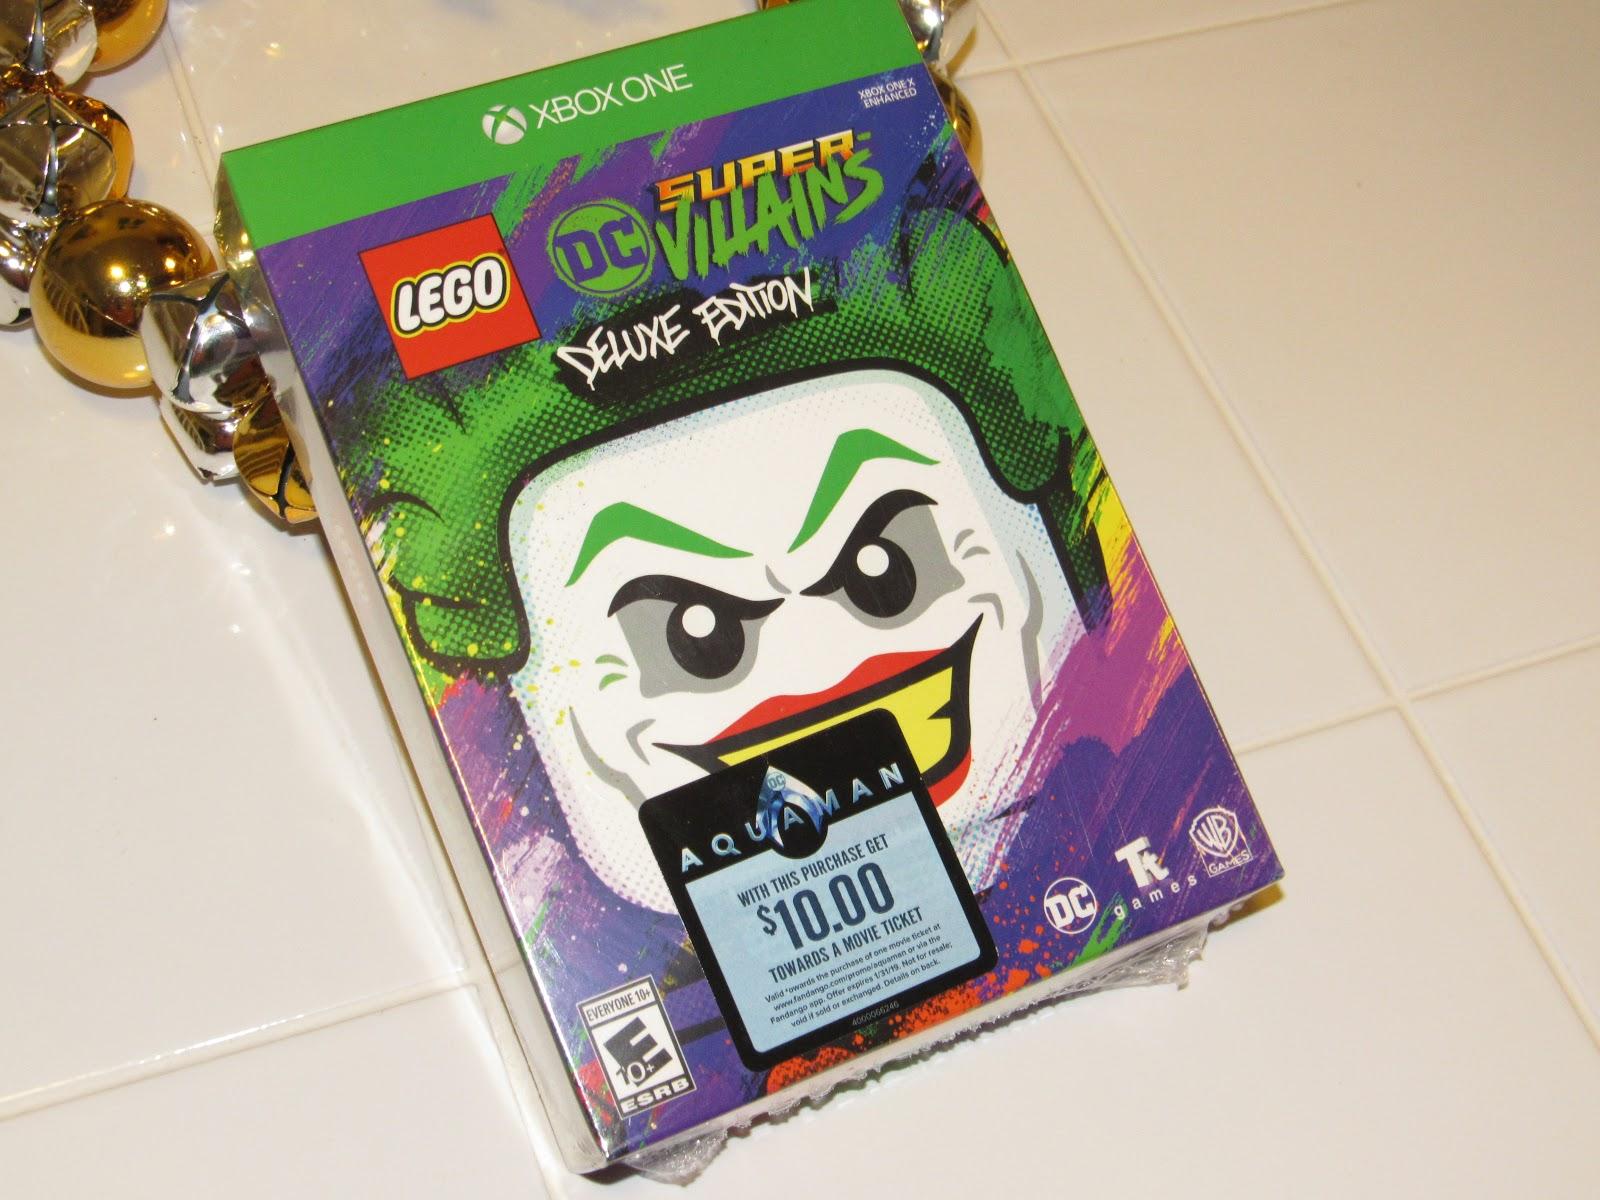 lego dc super villains deluxe edition nintendo switch